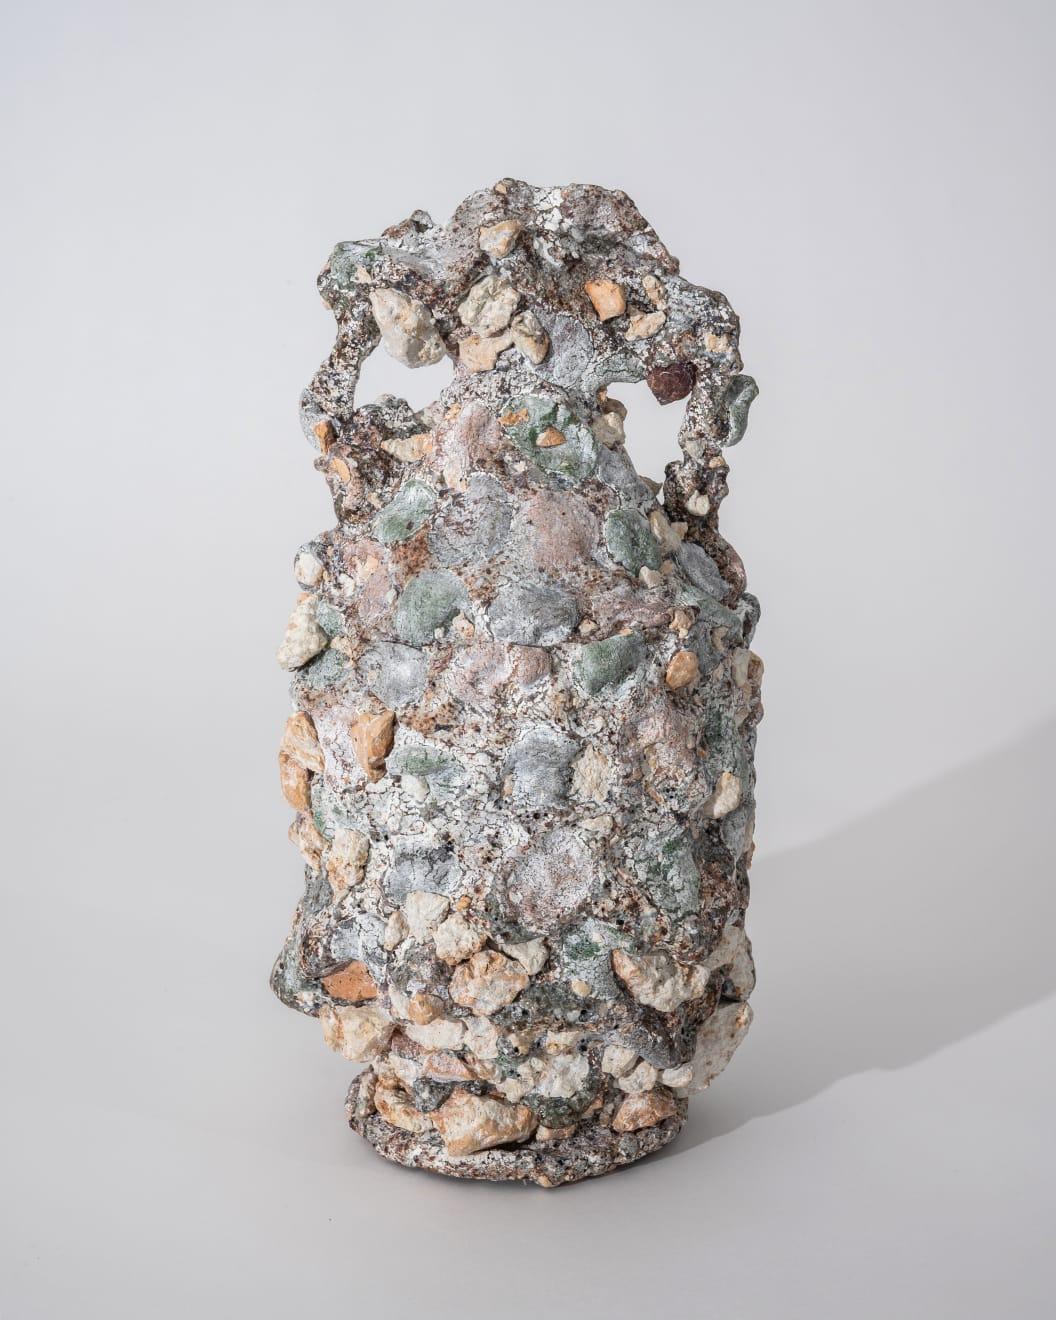 Masaomi Yasunaga, 熔ける器 / melting vessel, 2020